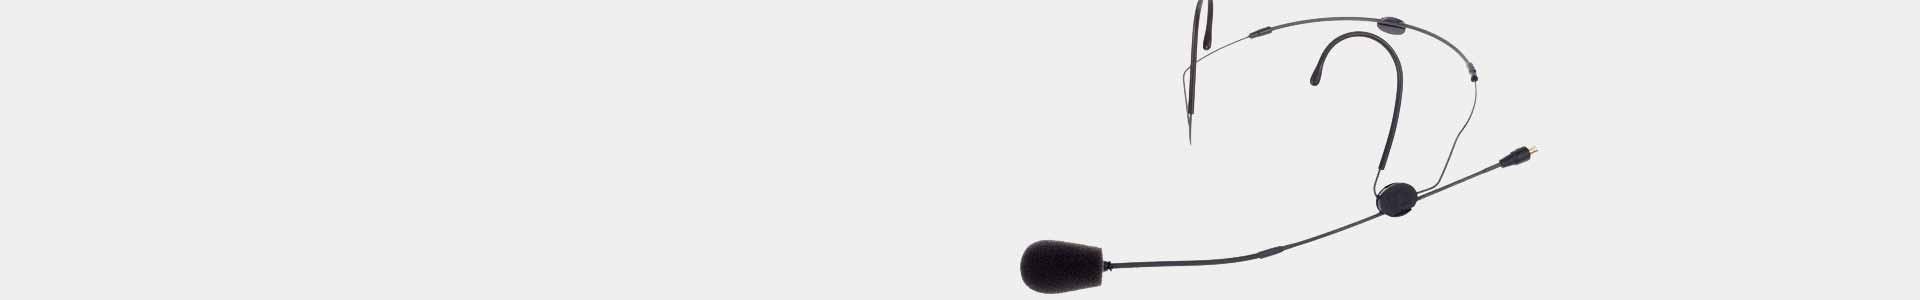 Micrófonos de Diadema Sennheiser en Avacab Audiovisuales